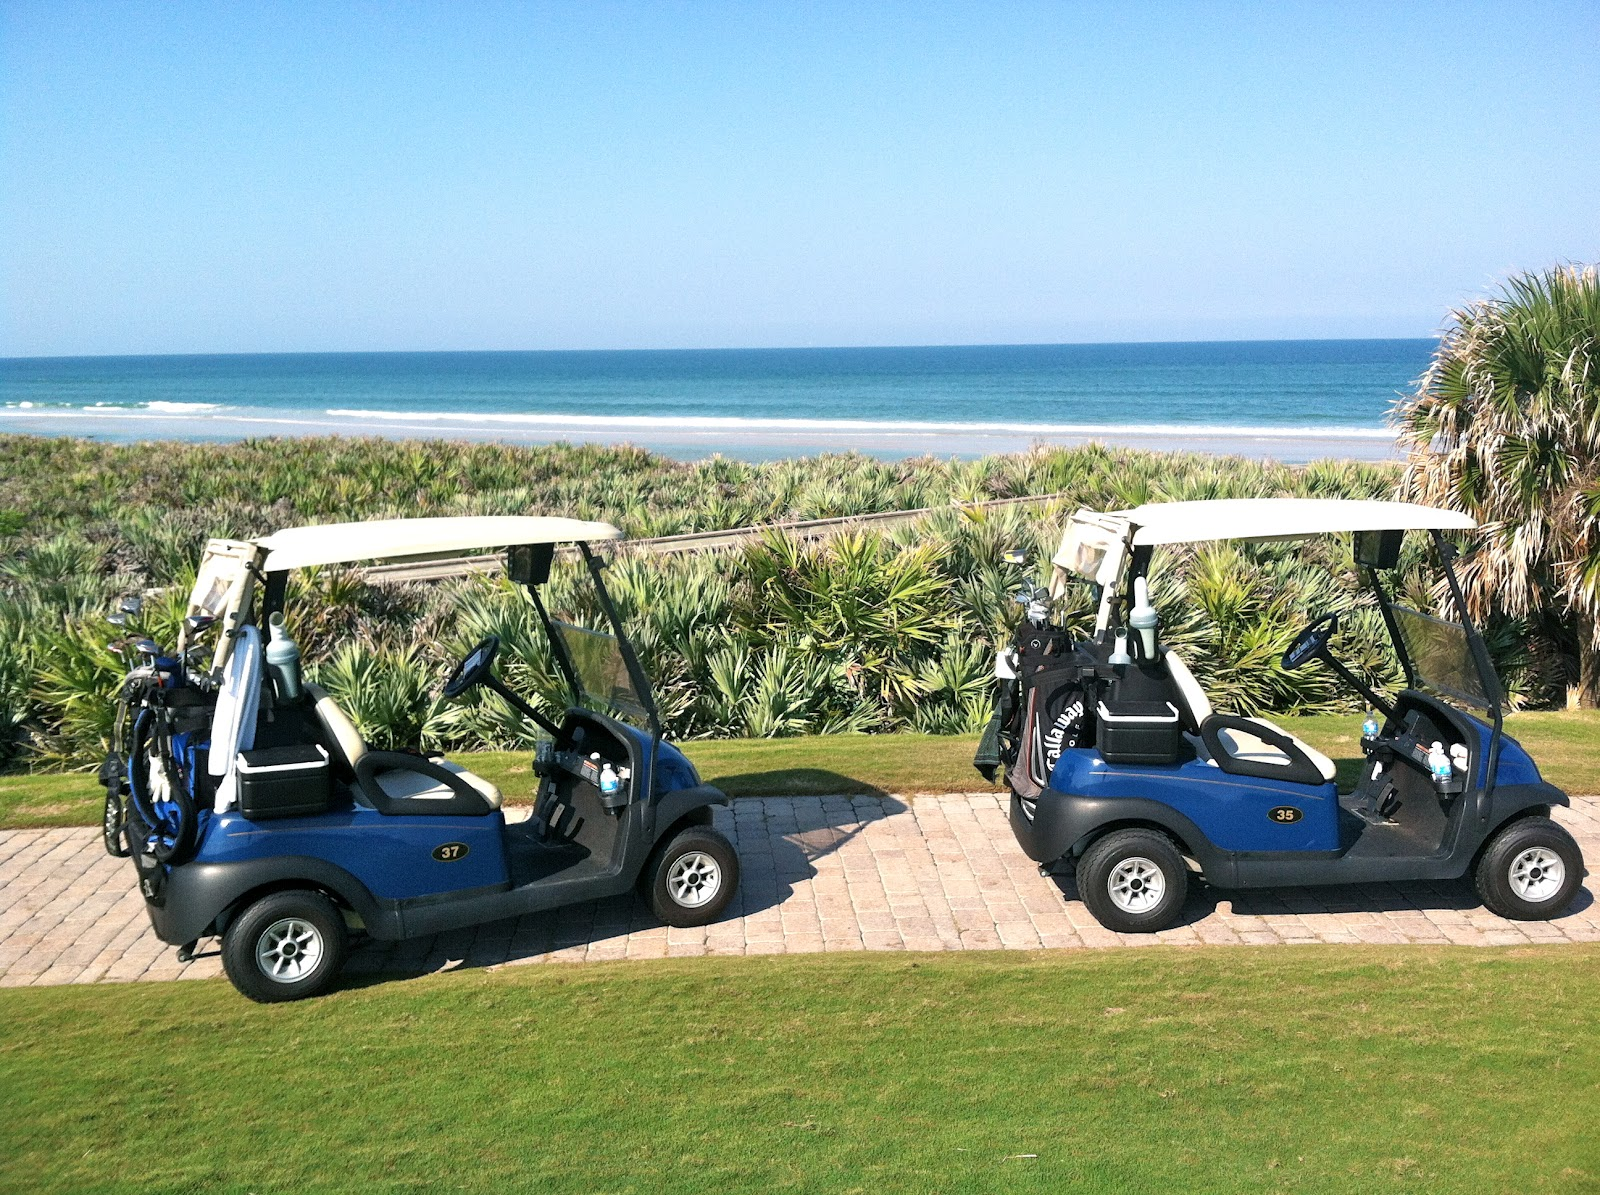 The World Of Deej The Ocean Course At Hammock Beach Resort